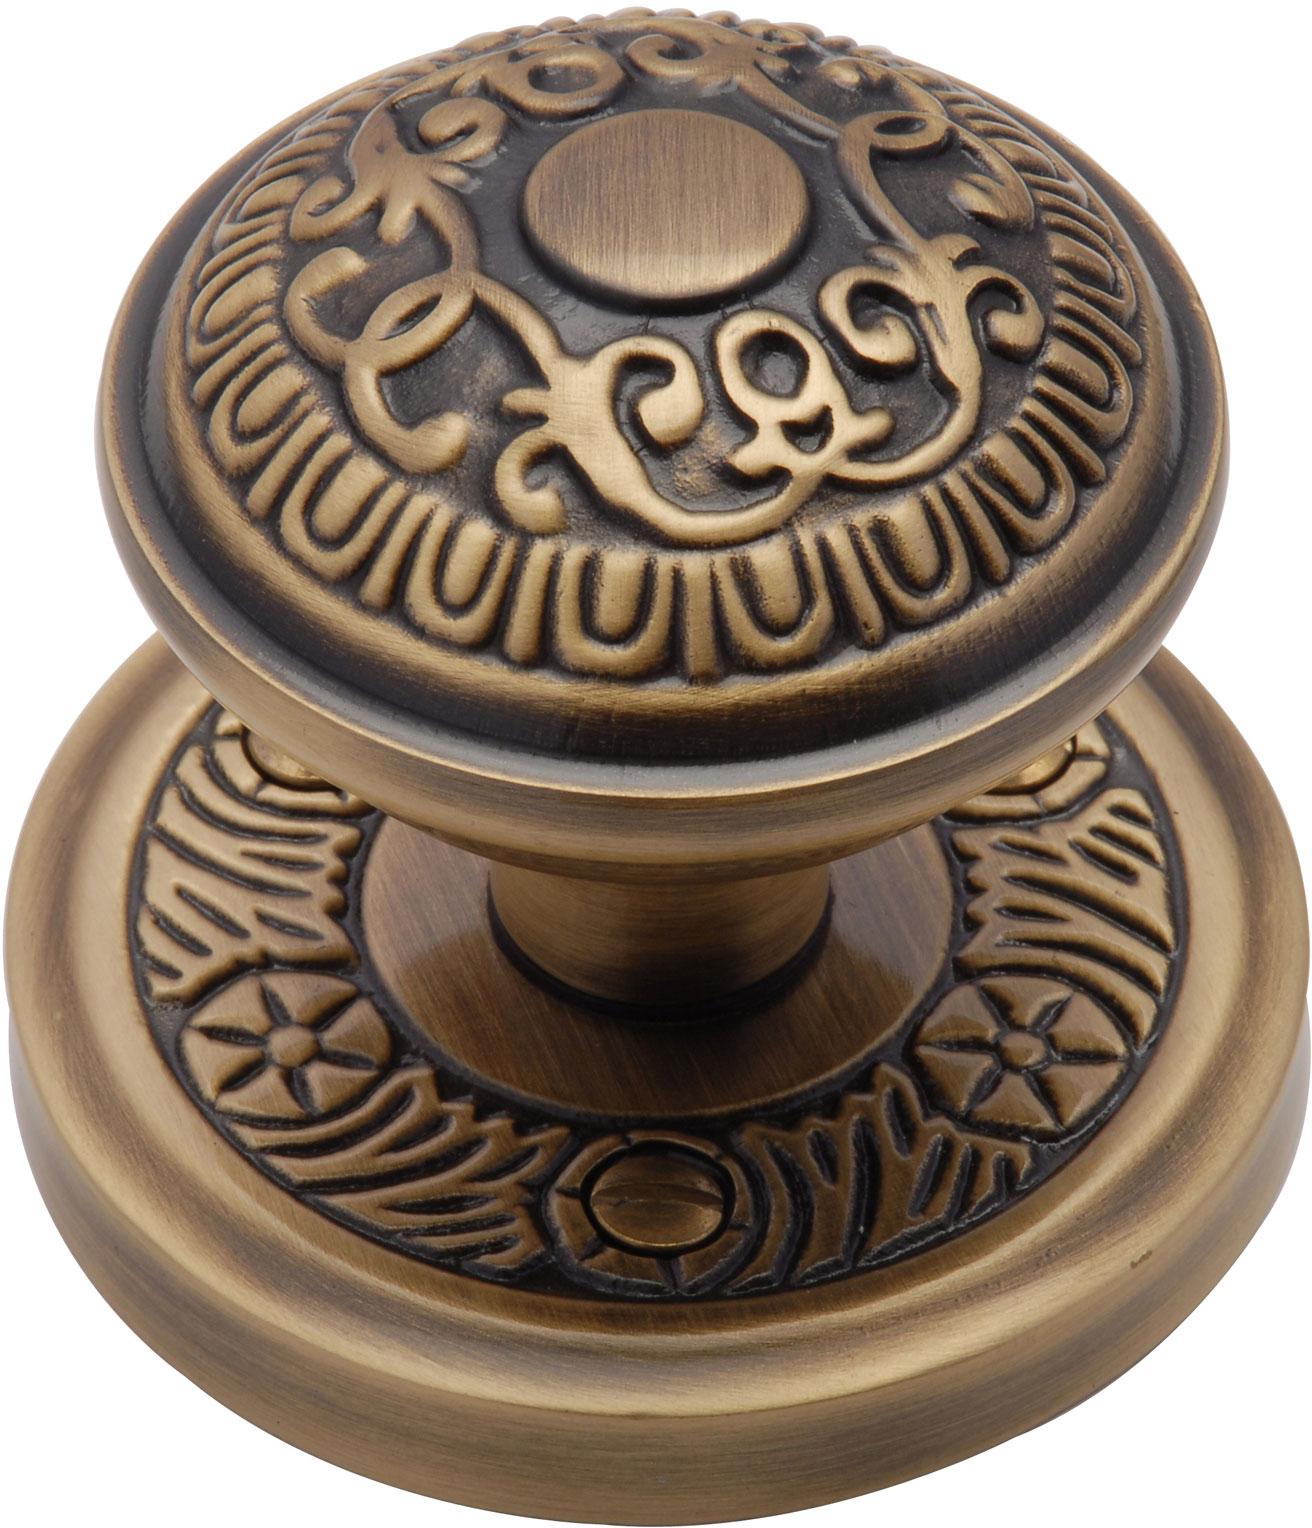 aydon decorative mortice knob door handle tools diy and building materials ironmongery